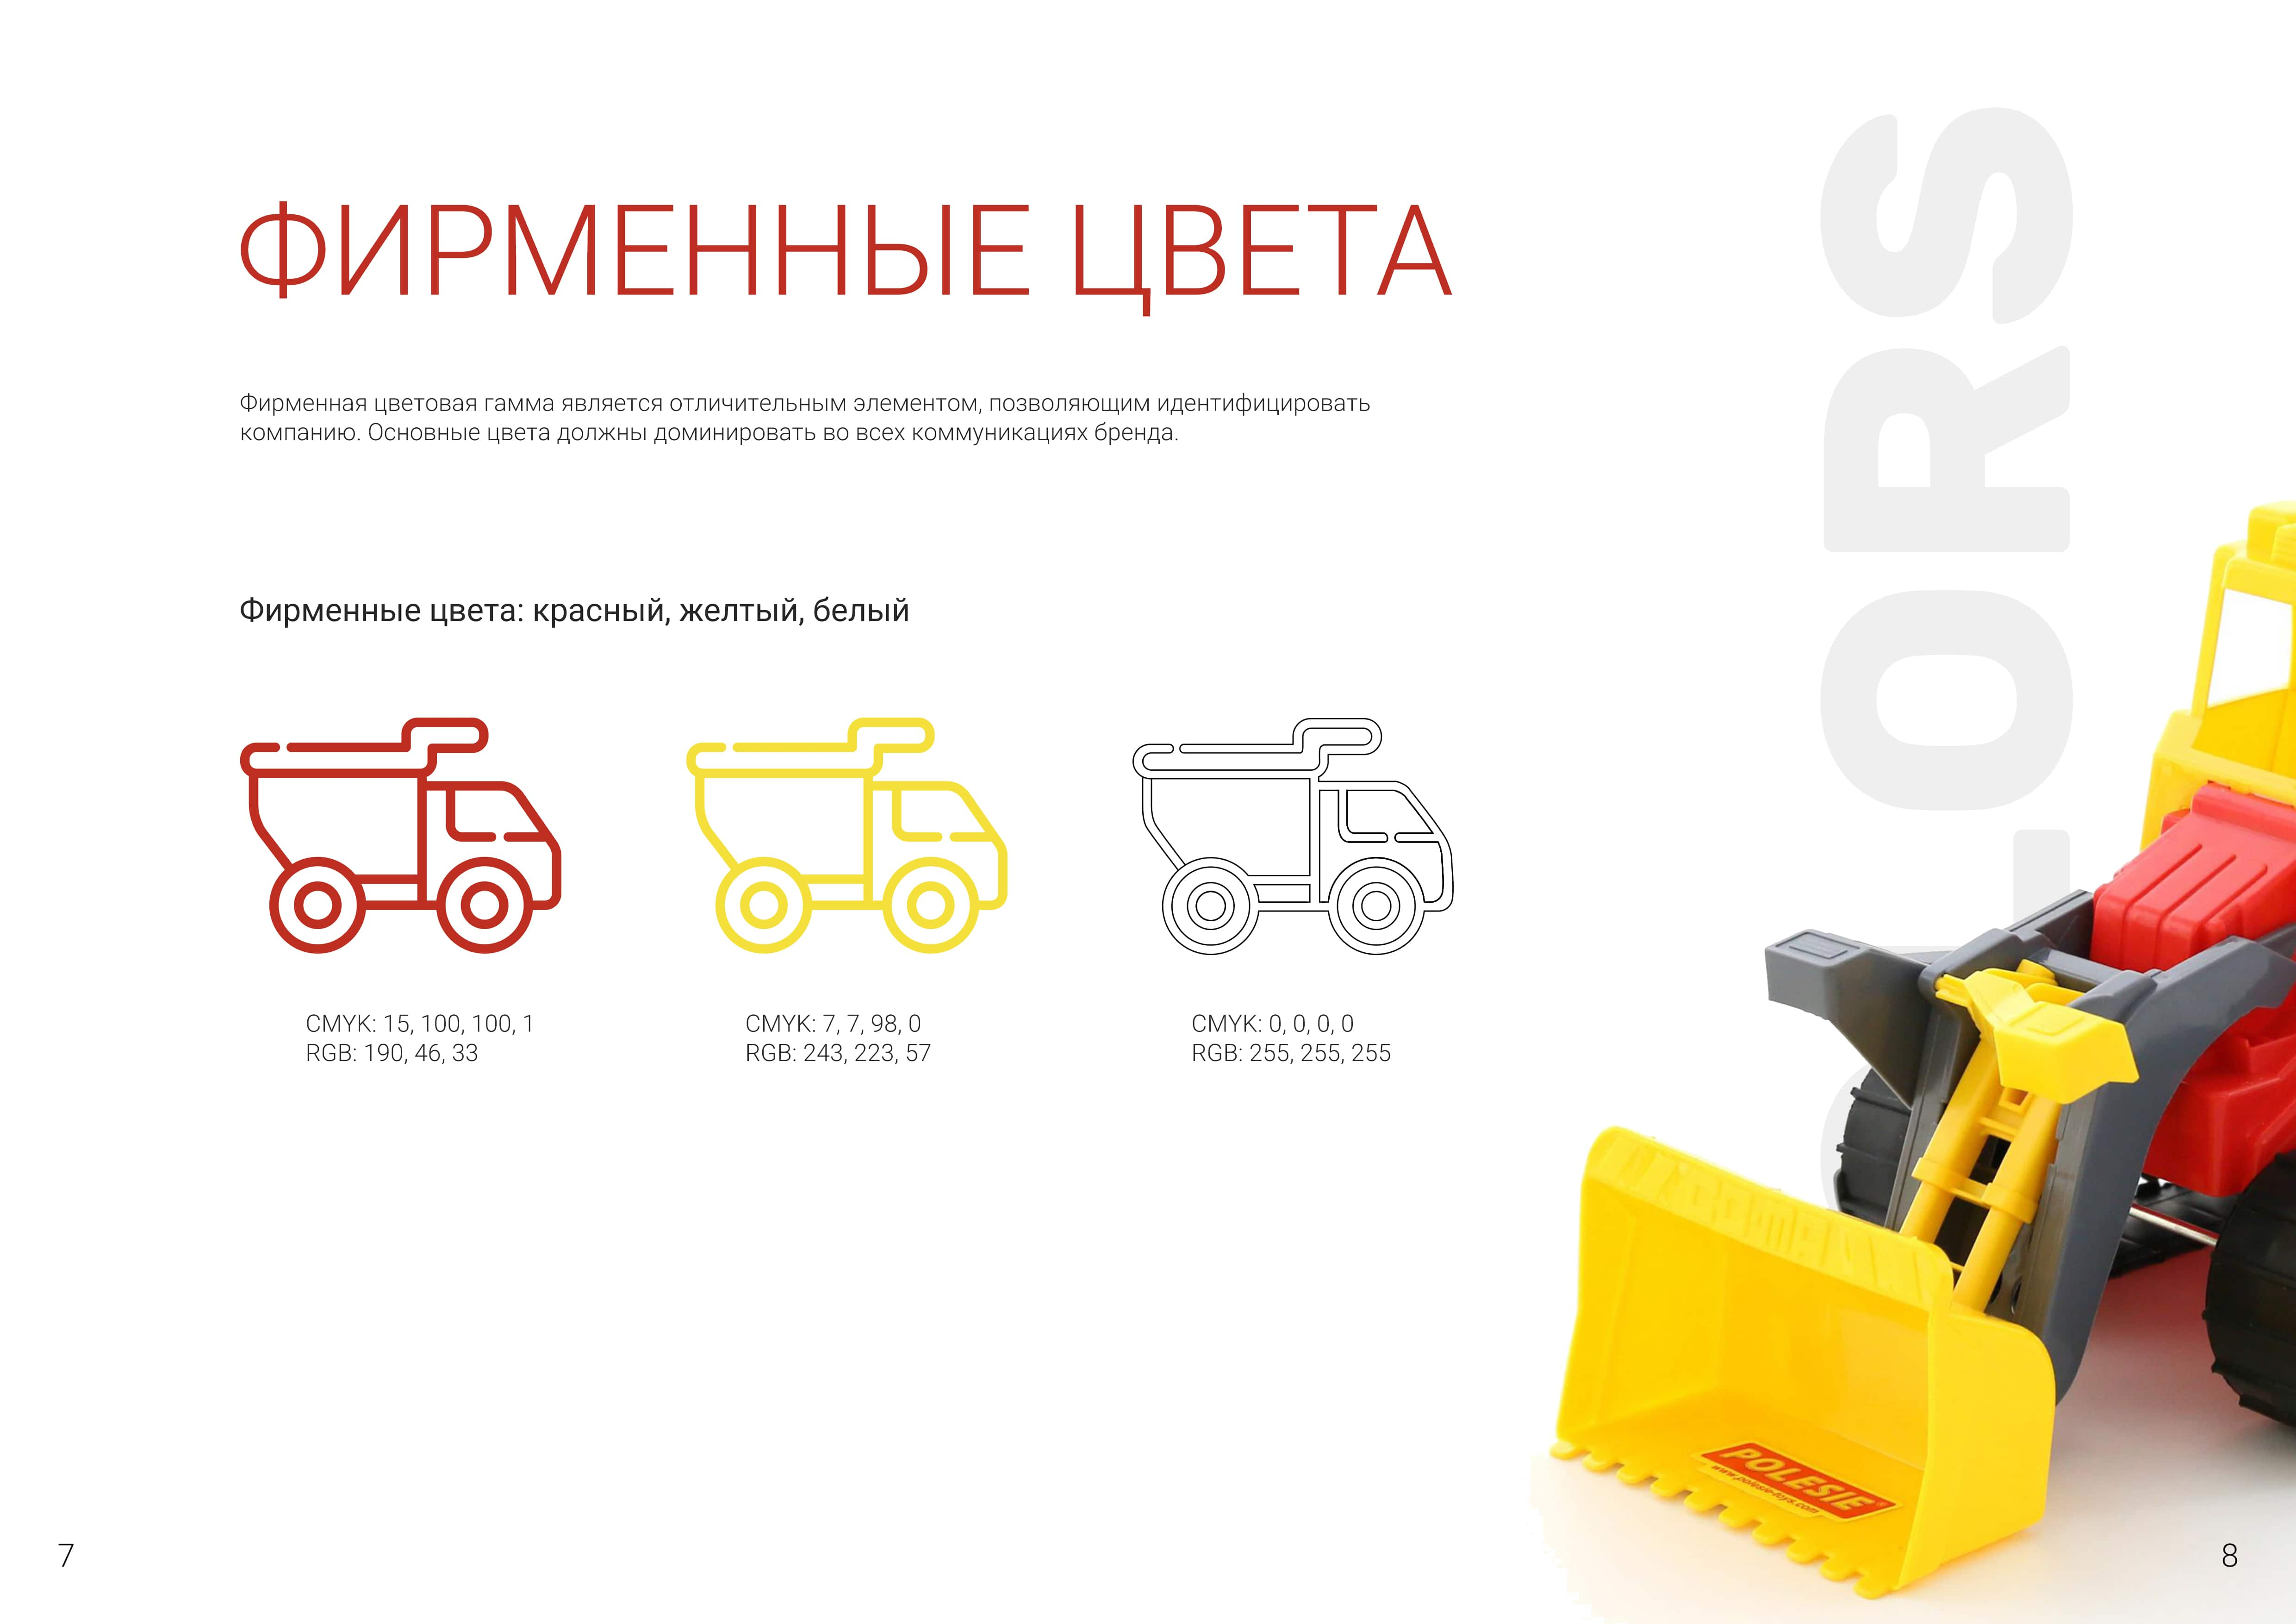 Разработка фирменного стиля на основании готового логотипа фото f_2605aba494267165.jpg